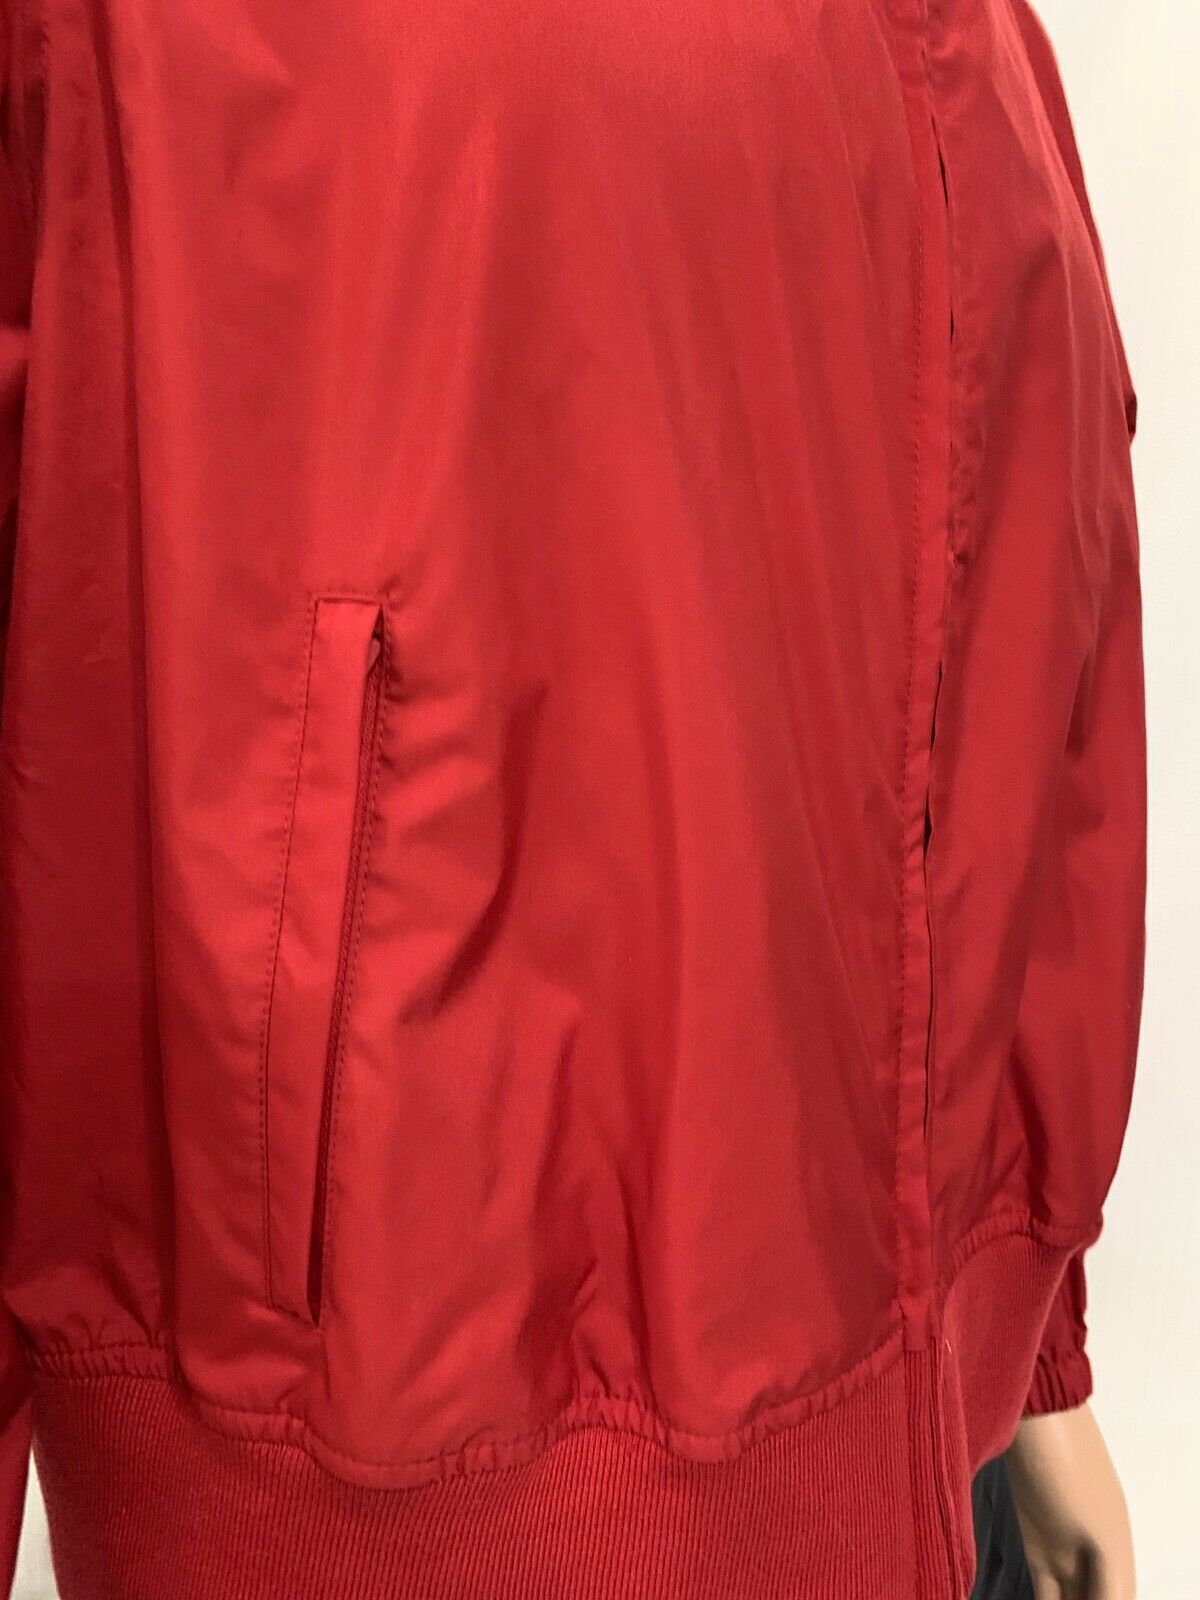 Women TOMMY HILFIGER Jeans RAIN Jacket Coat Windbreaker Pockets RED No Lining XL image 4